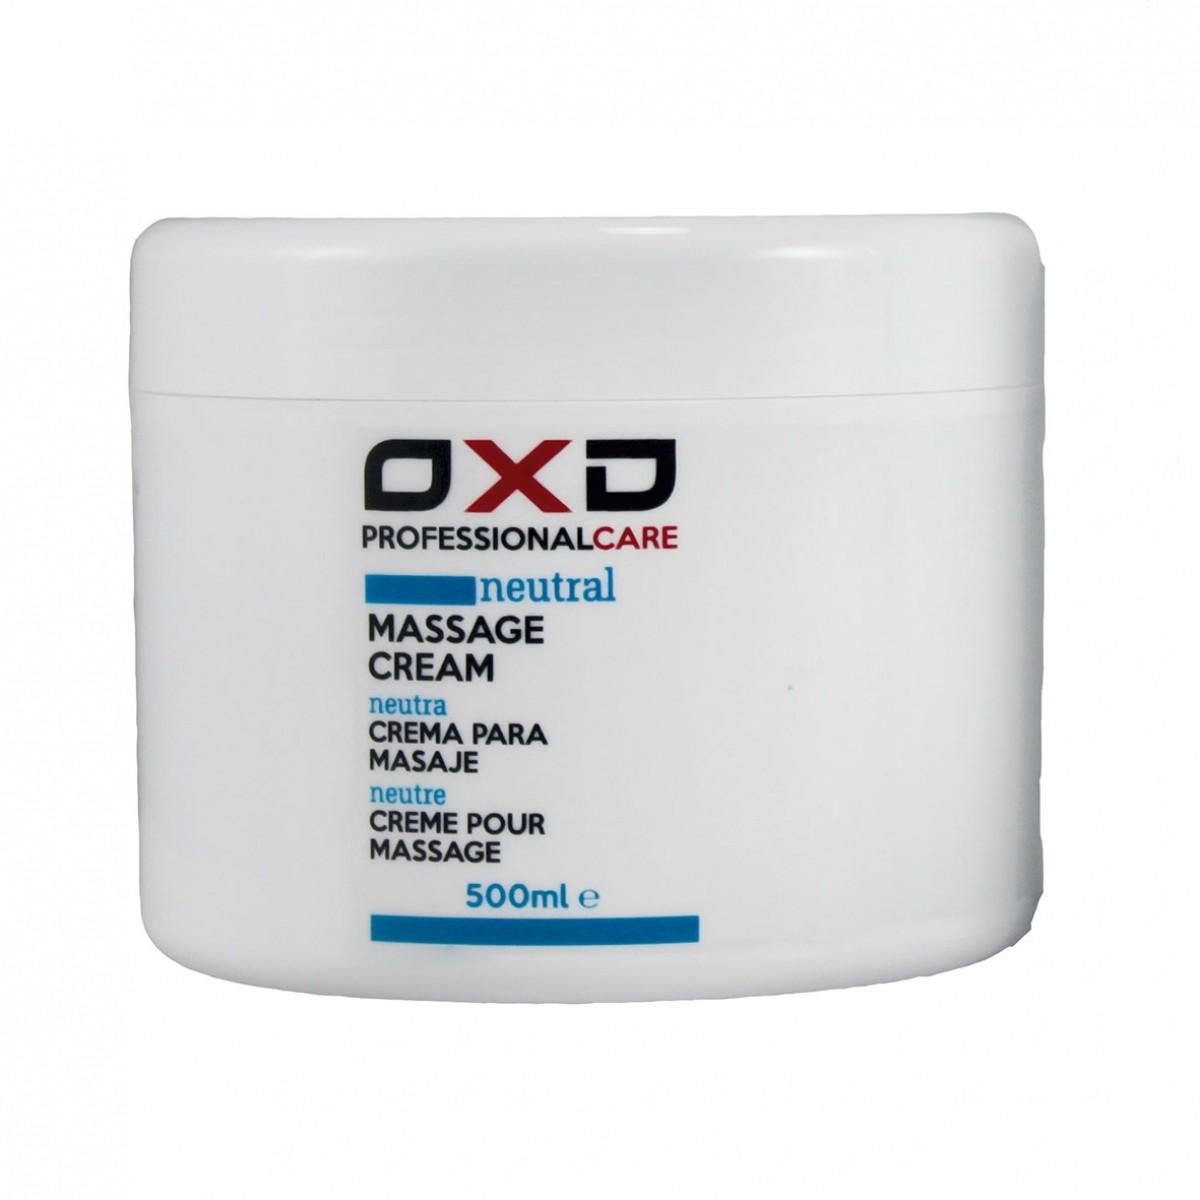 OXDNeutralmassagecreme500ml-31